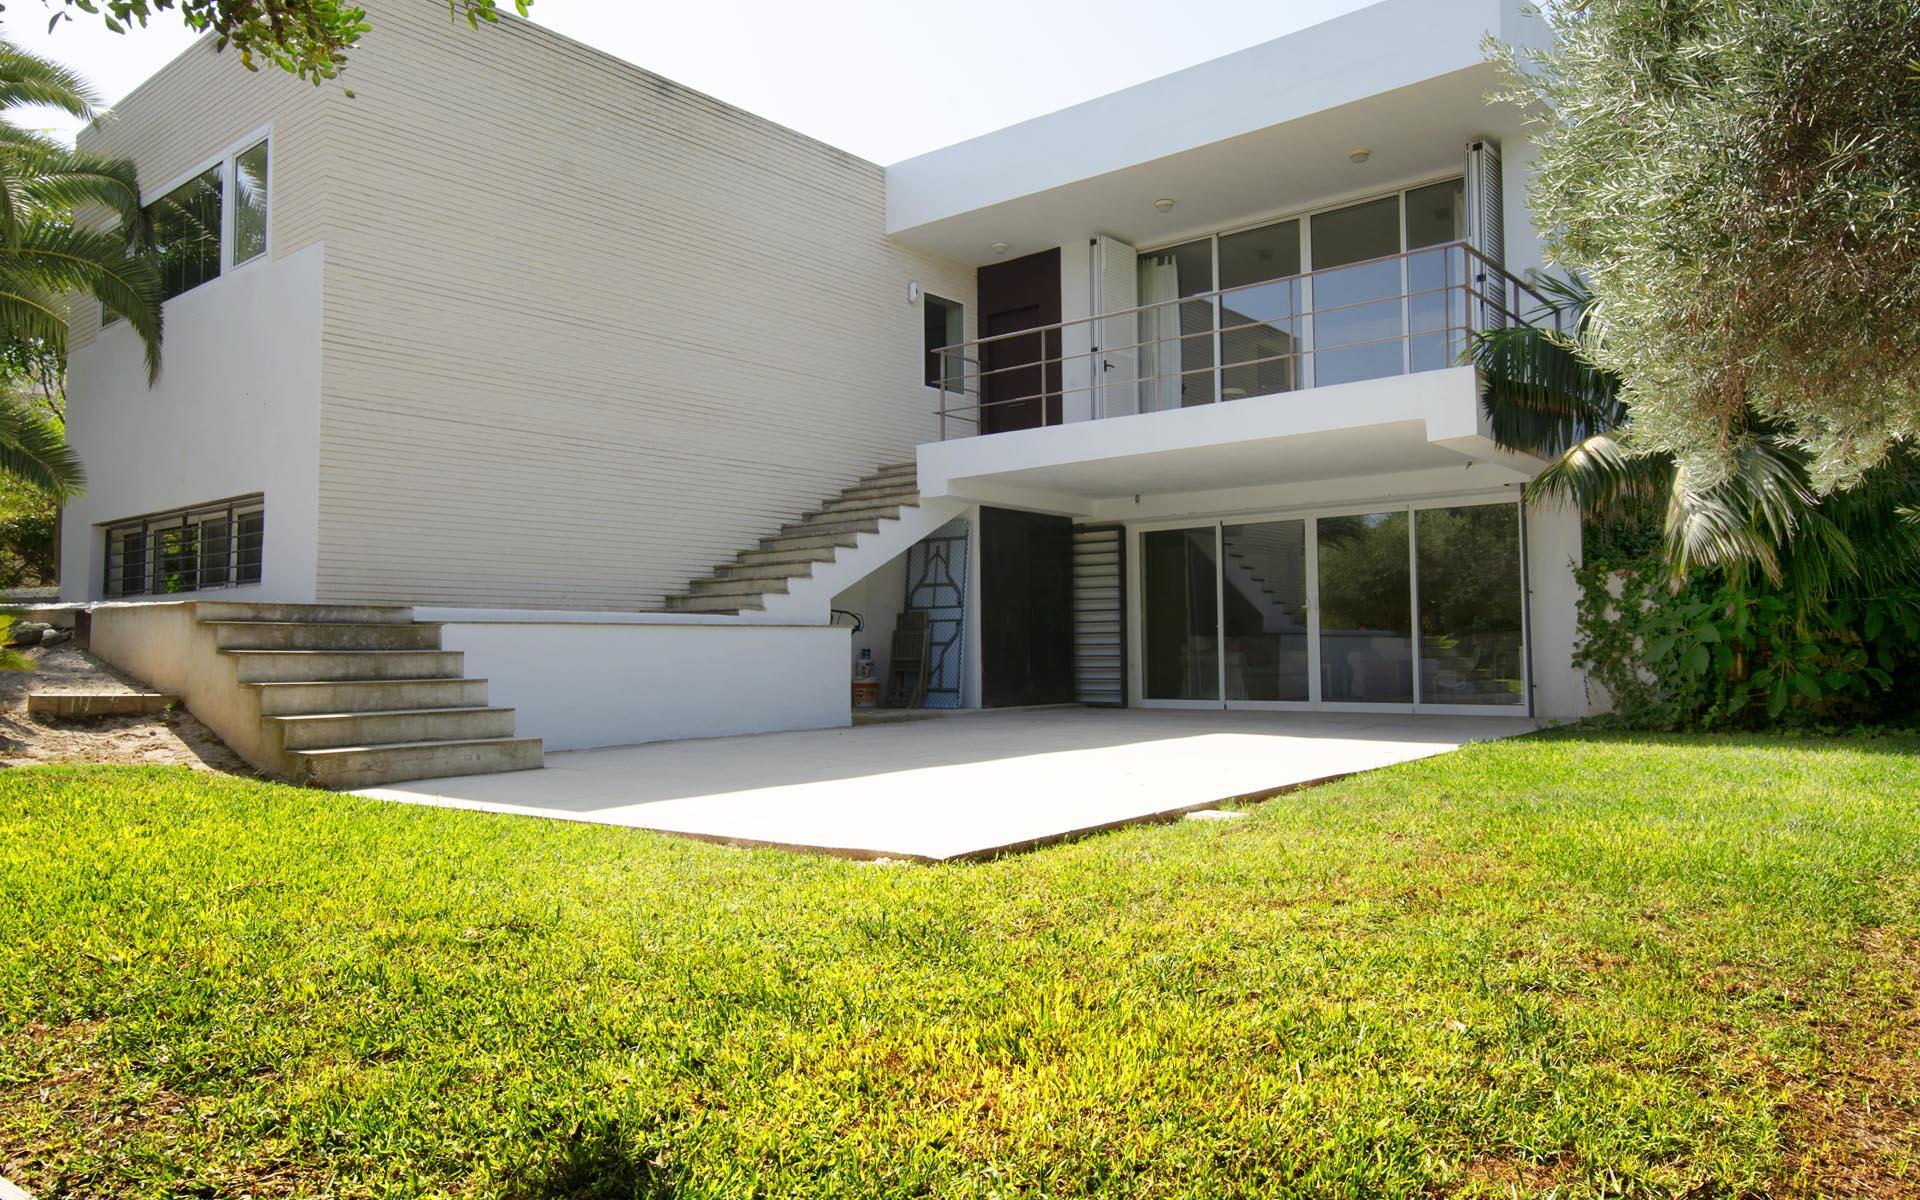 A Masterpiece of Architecture, Vistahermosa Alicante